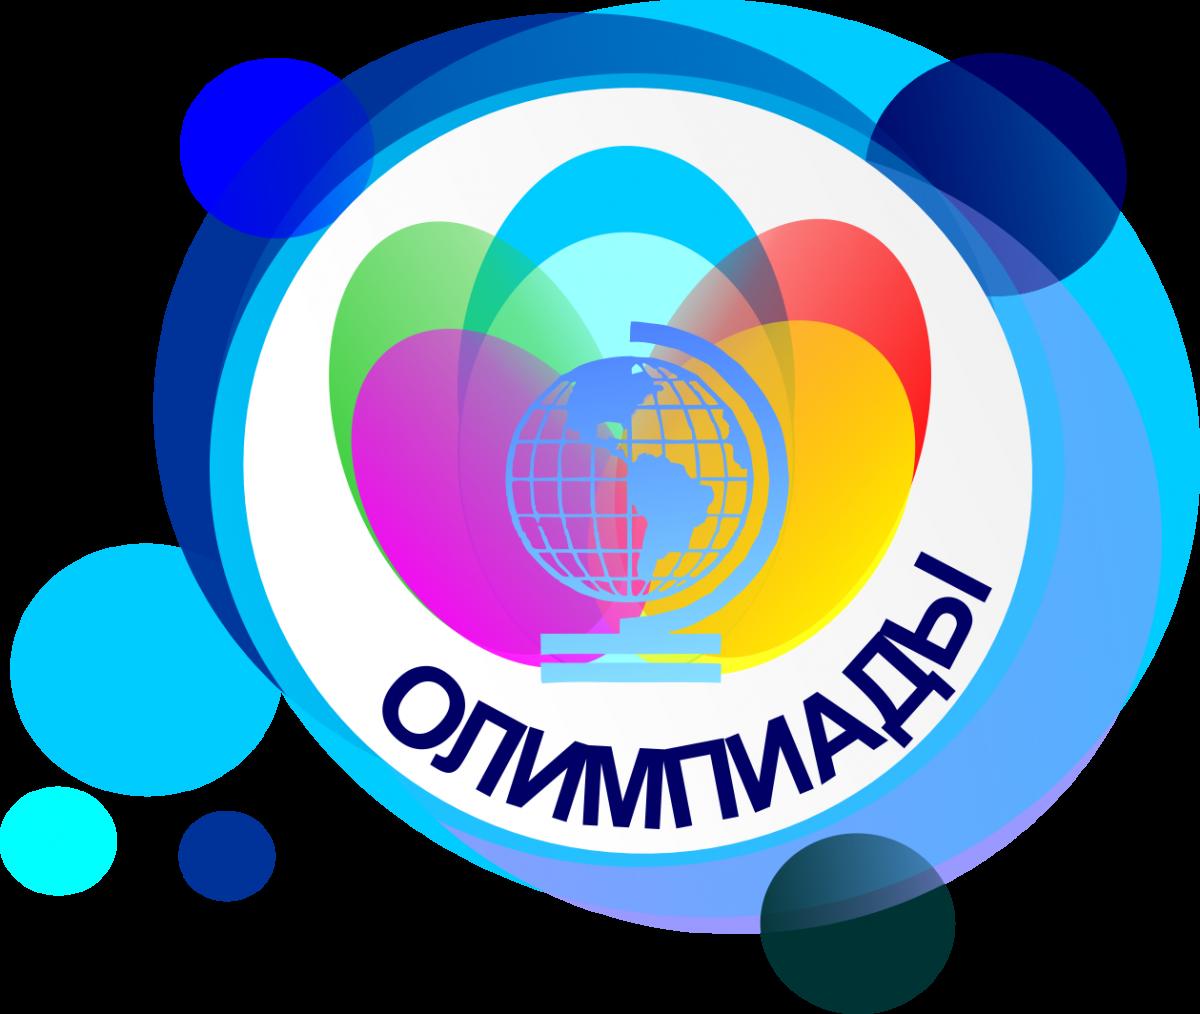 http://school2kovdor.ucoz.org/foto/knopka_11.png